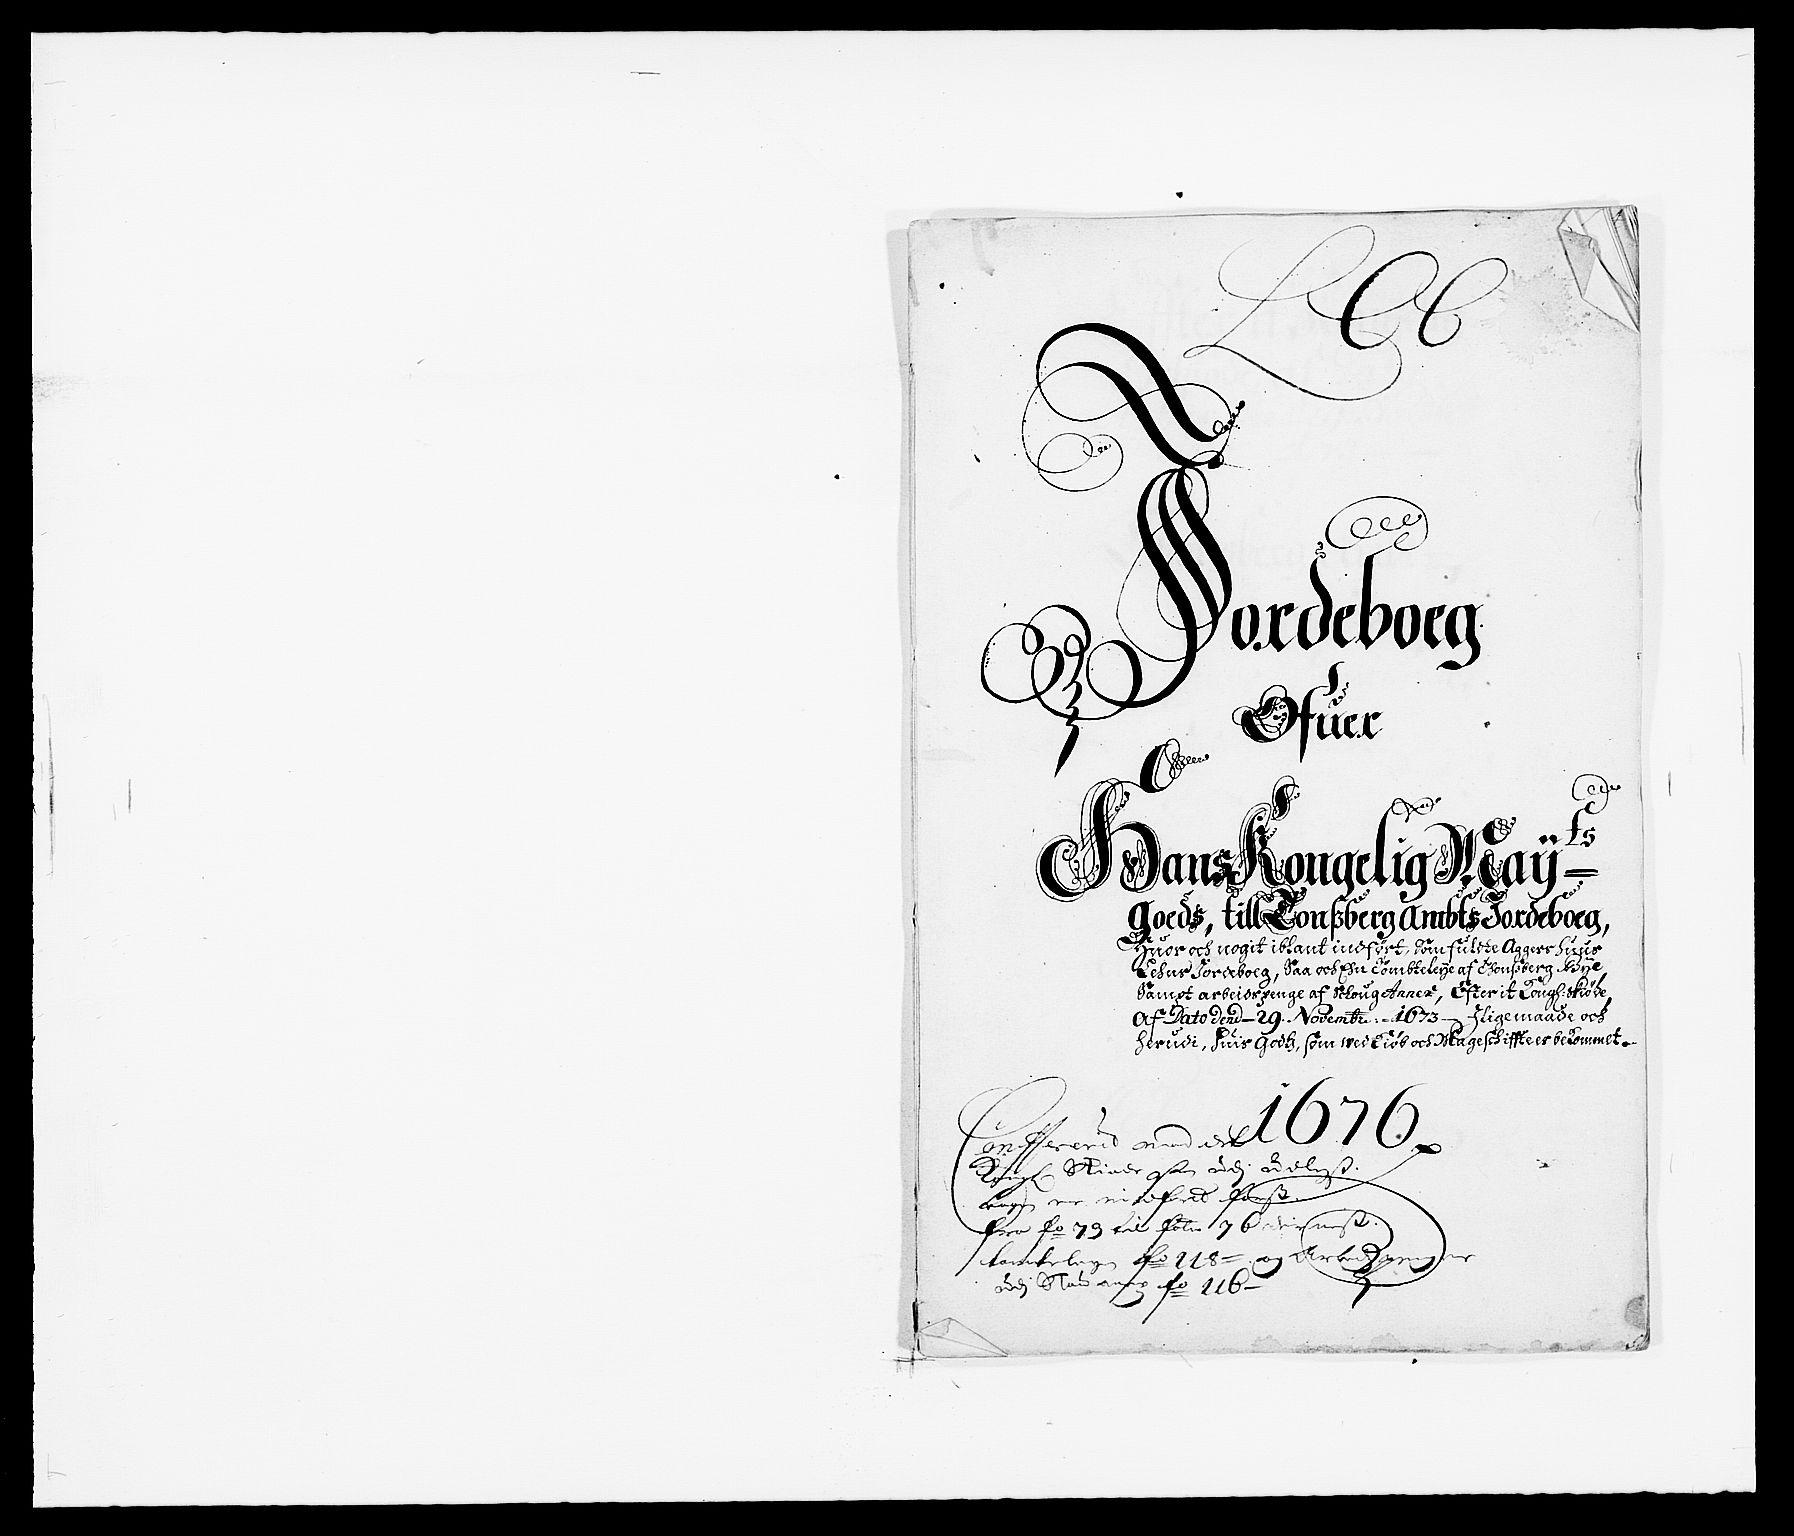 RA, Rentekammeret inntil 1814, Reviderte regnskaper, Fogderegnskap, R32/L1845: Fogderegnskap Jarlsberg grevskap, 1676-1678, s. 112